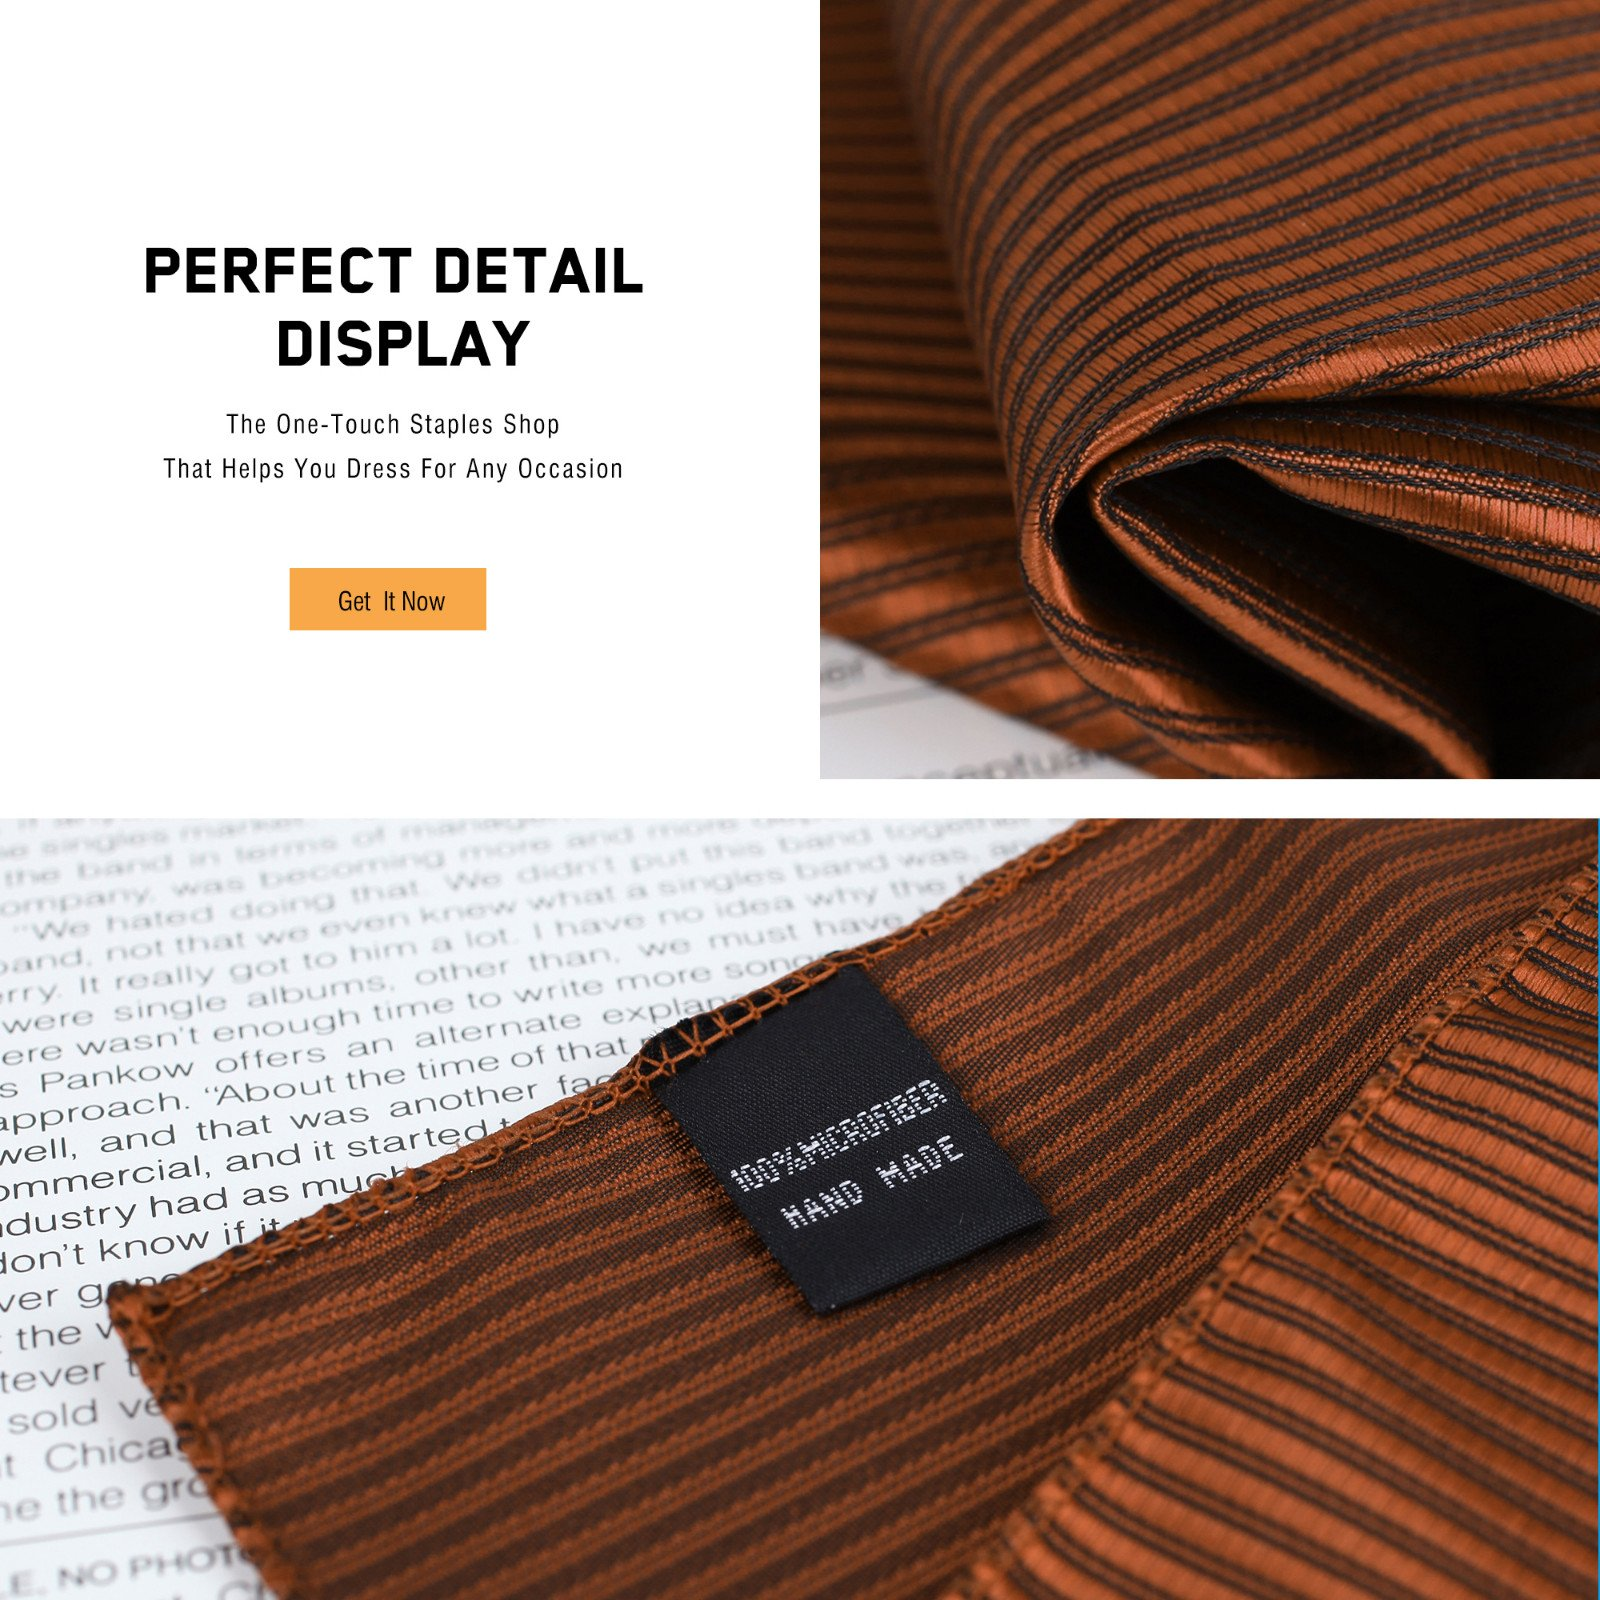 DEIA0004 Designer Stripes Microfiber Birthday Gifts for Mens Hanky Set 5 Hankerchiefs Set-Pink, Dark Orange, Grey, Beige, White By Dan Smith by Dan Smith (Image #3)